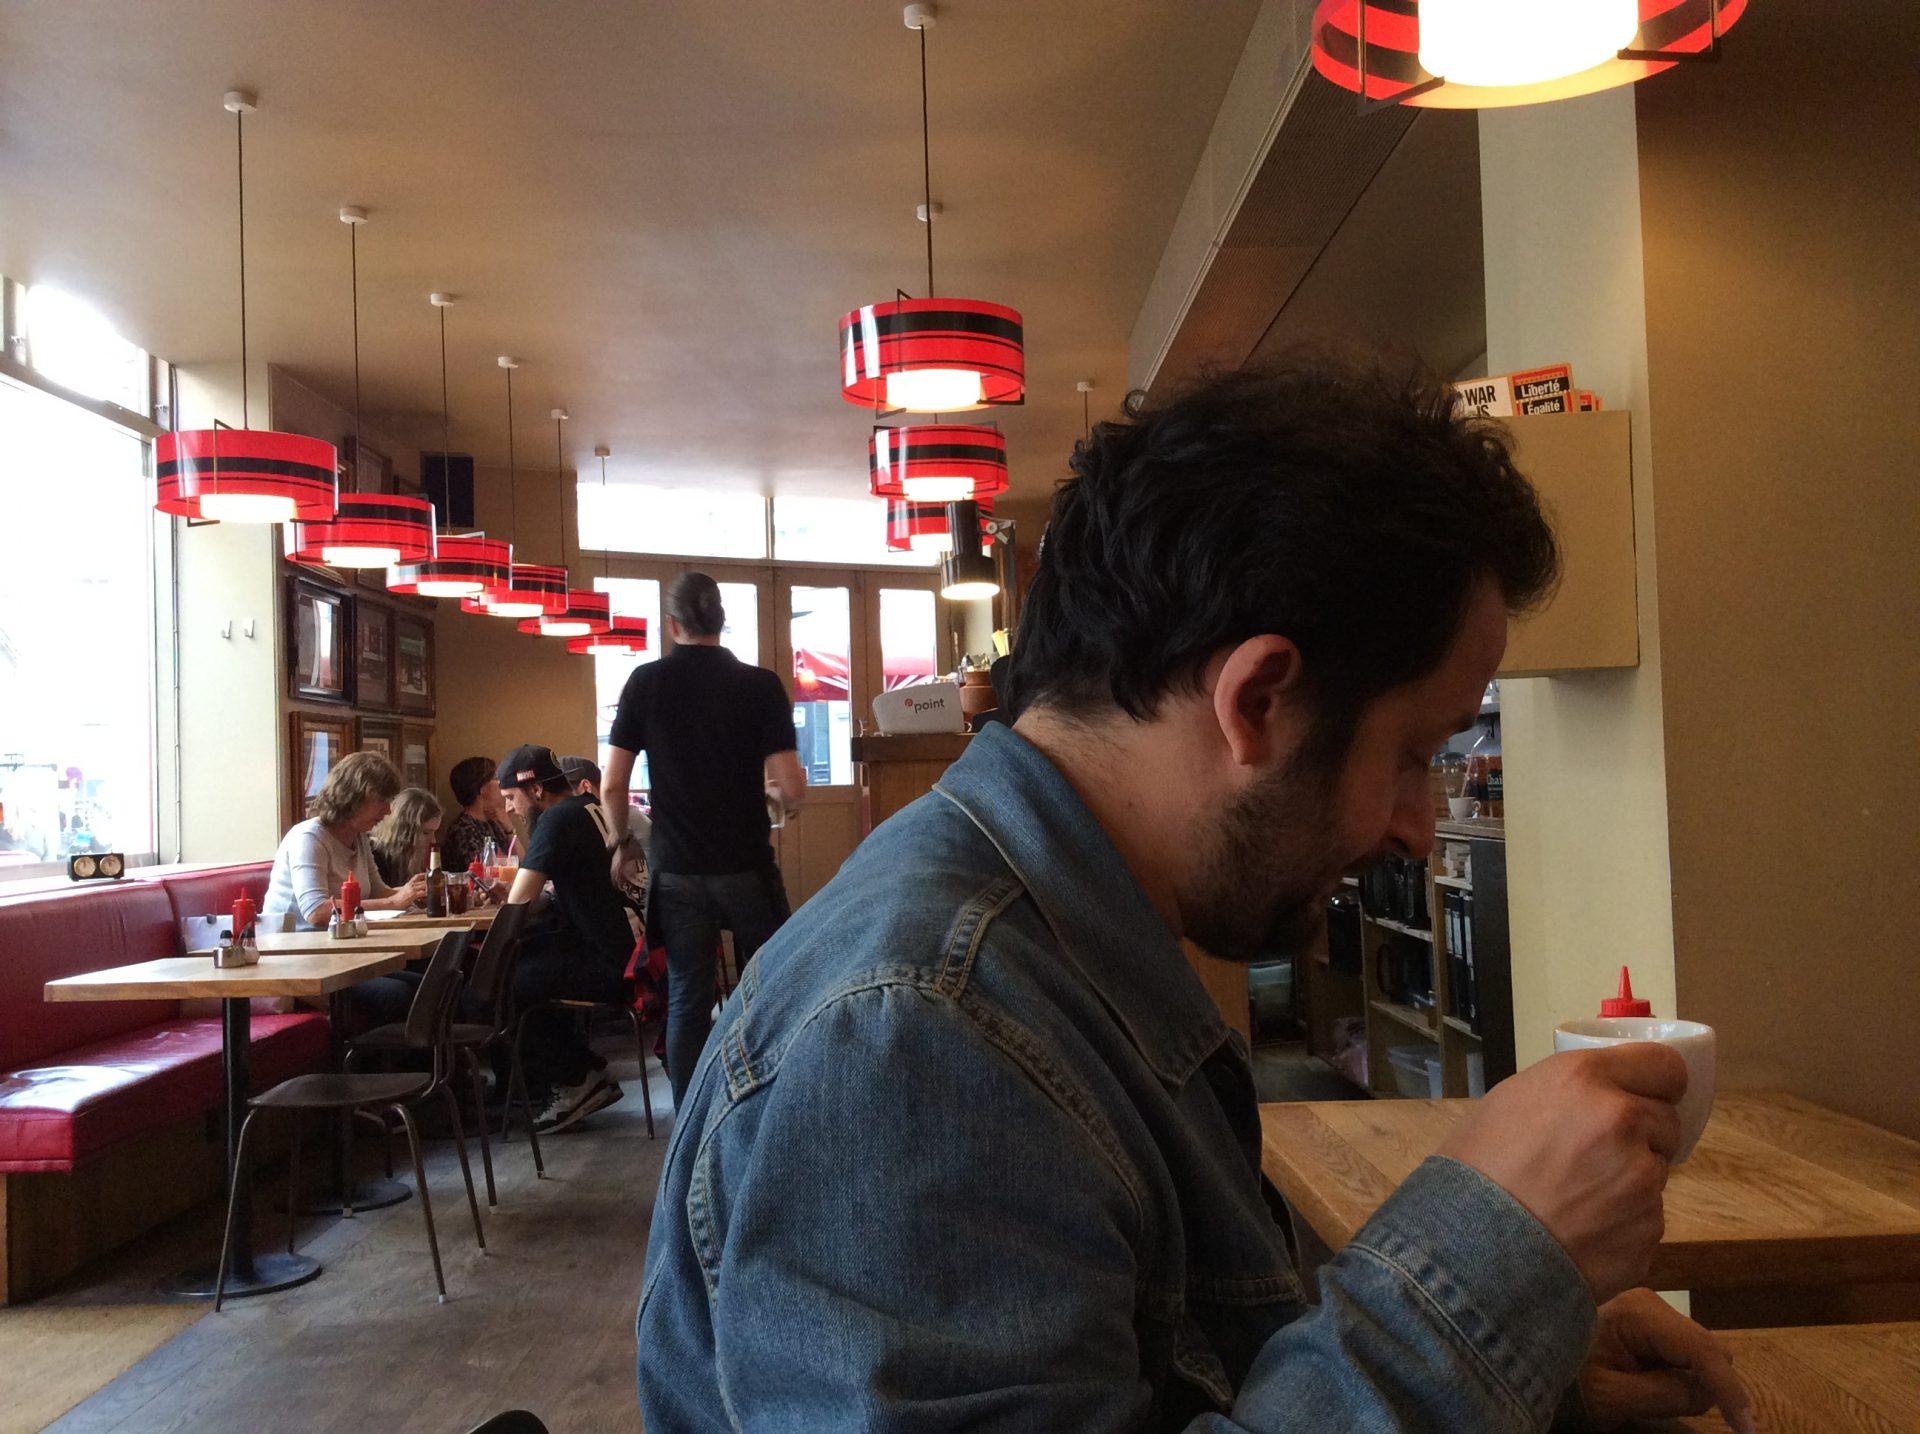 Marco seduto in un caffè